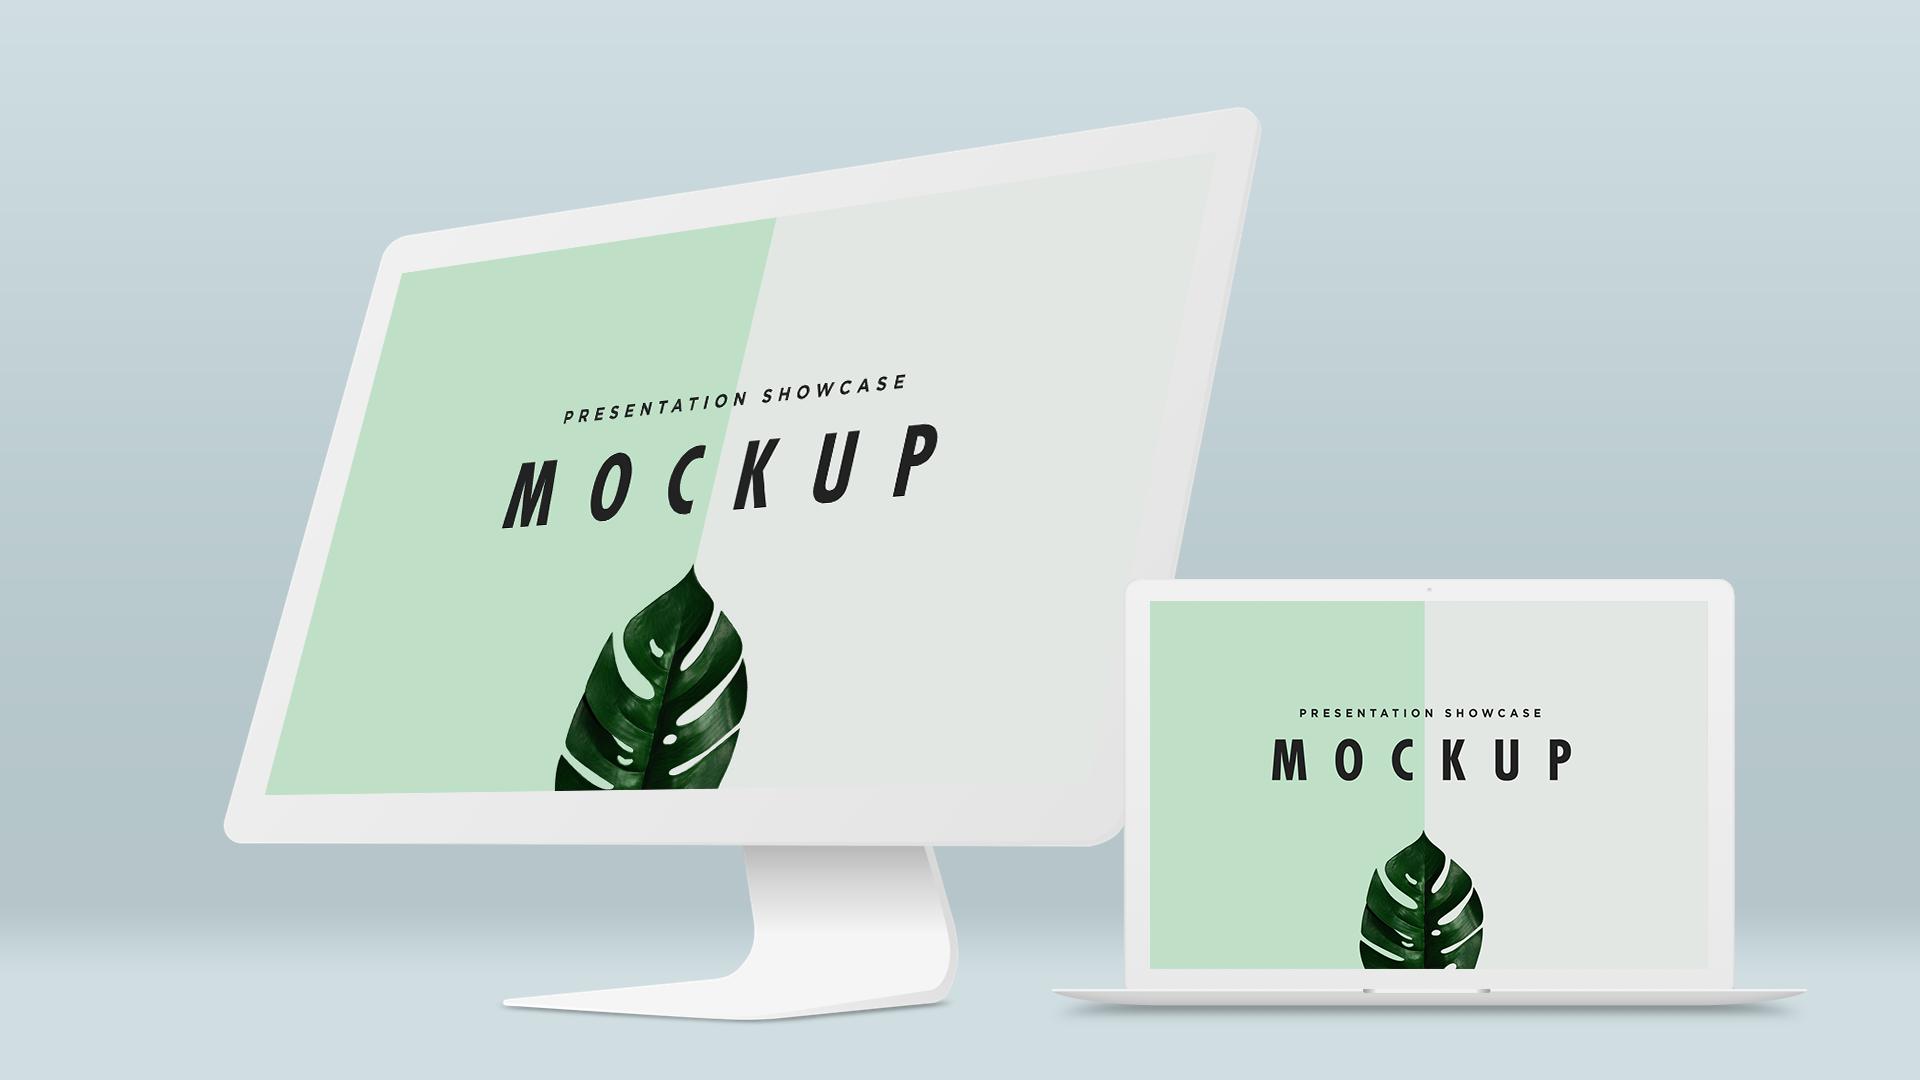 Dribbble Macbook Pro Imac Mockup Template Png By Abdullah Md Ishmam